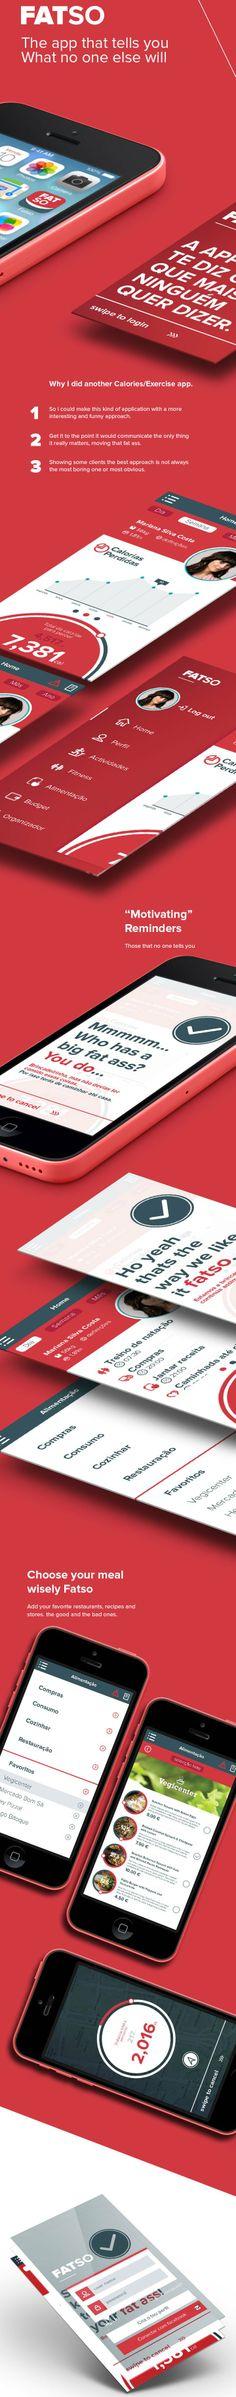 Fatso - The honest app [lol]